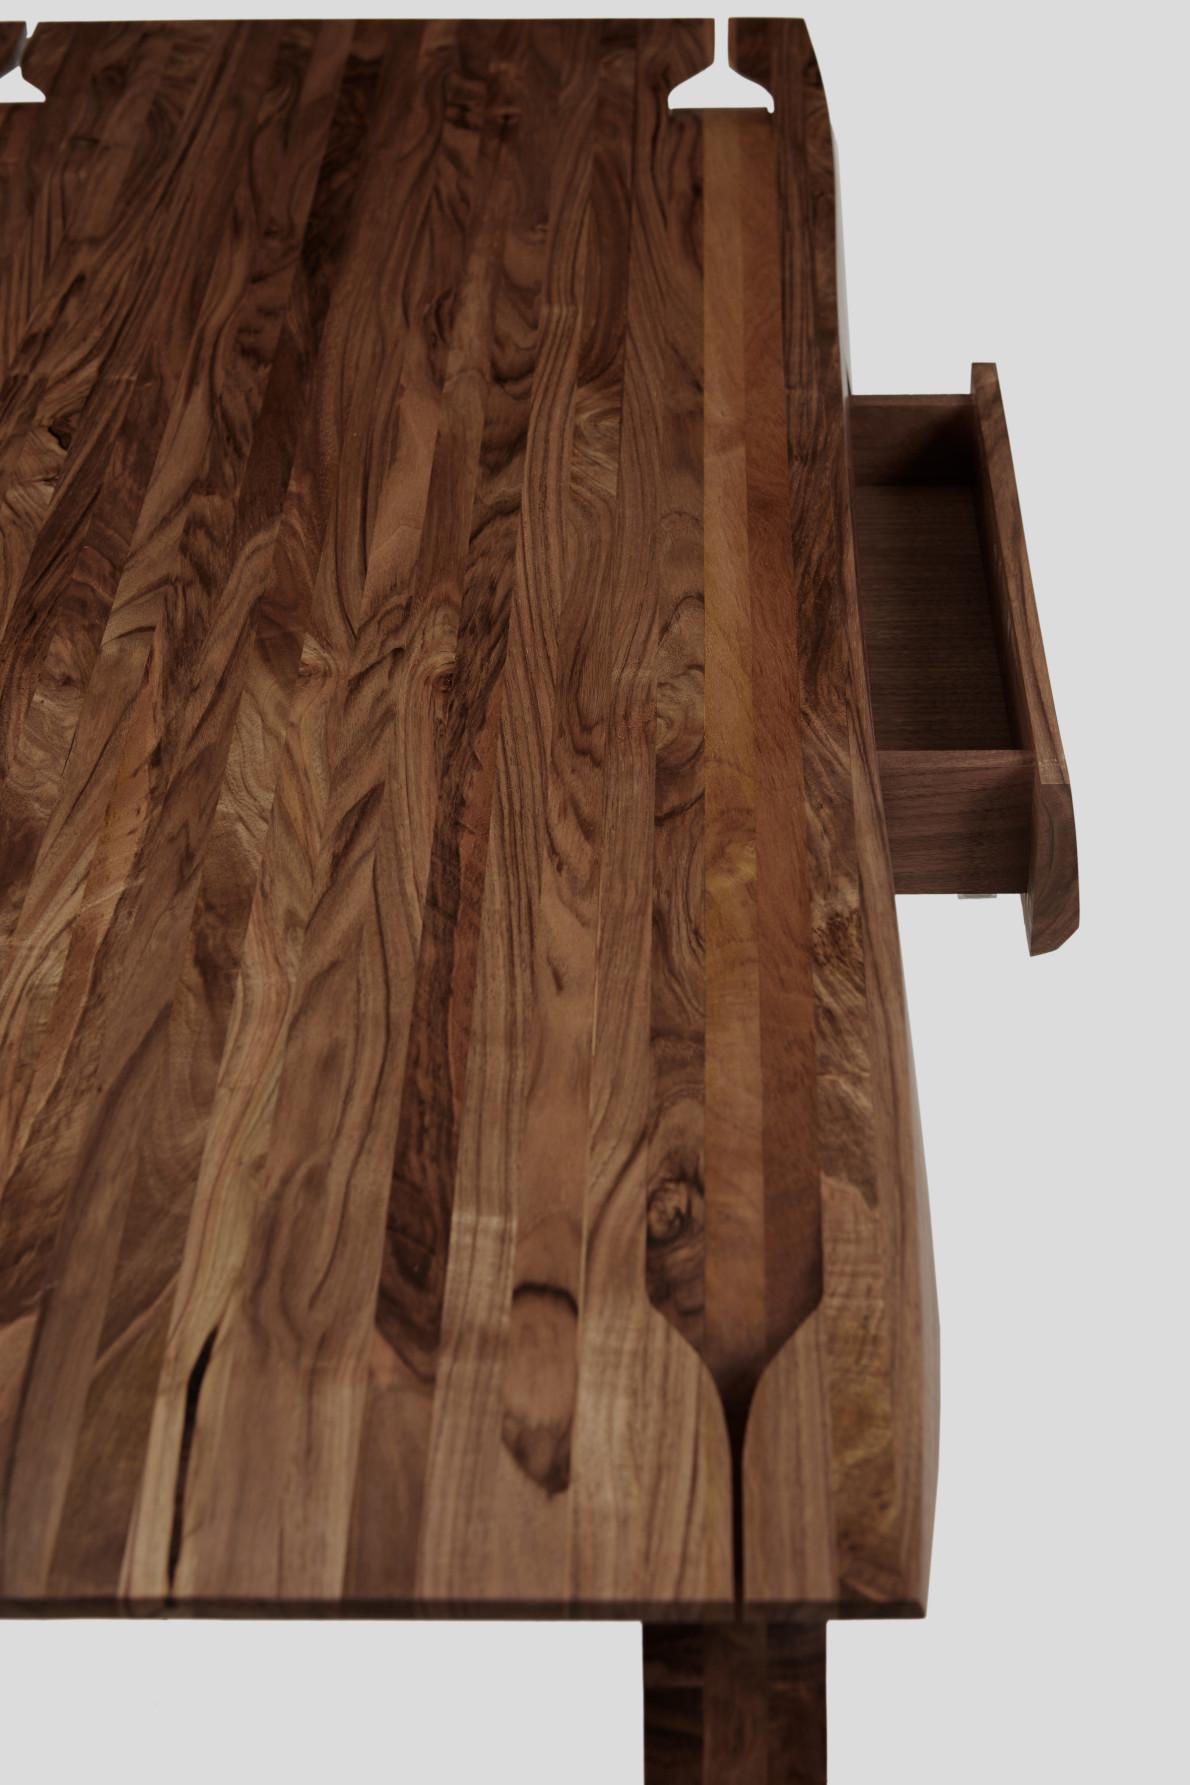 English Walnut Desk, Design no.5